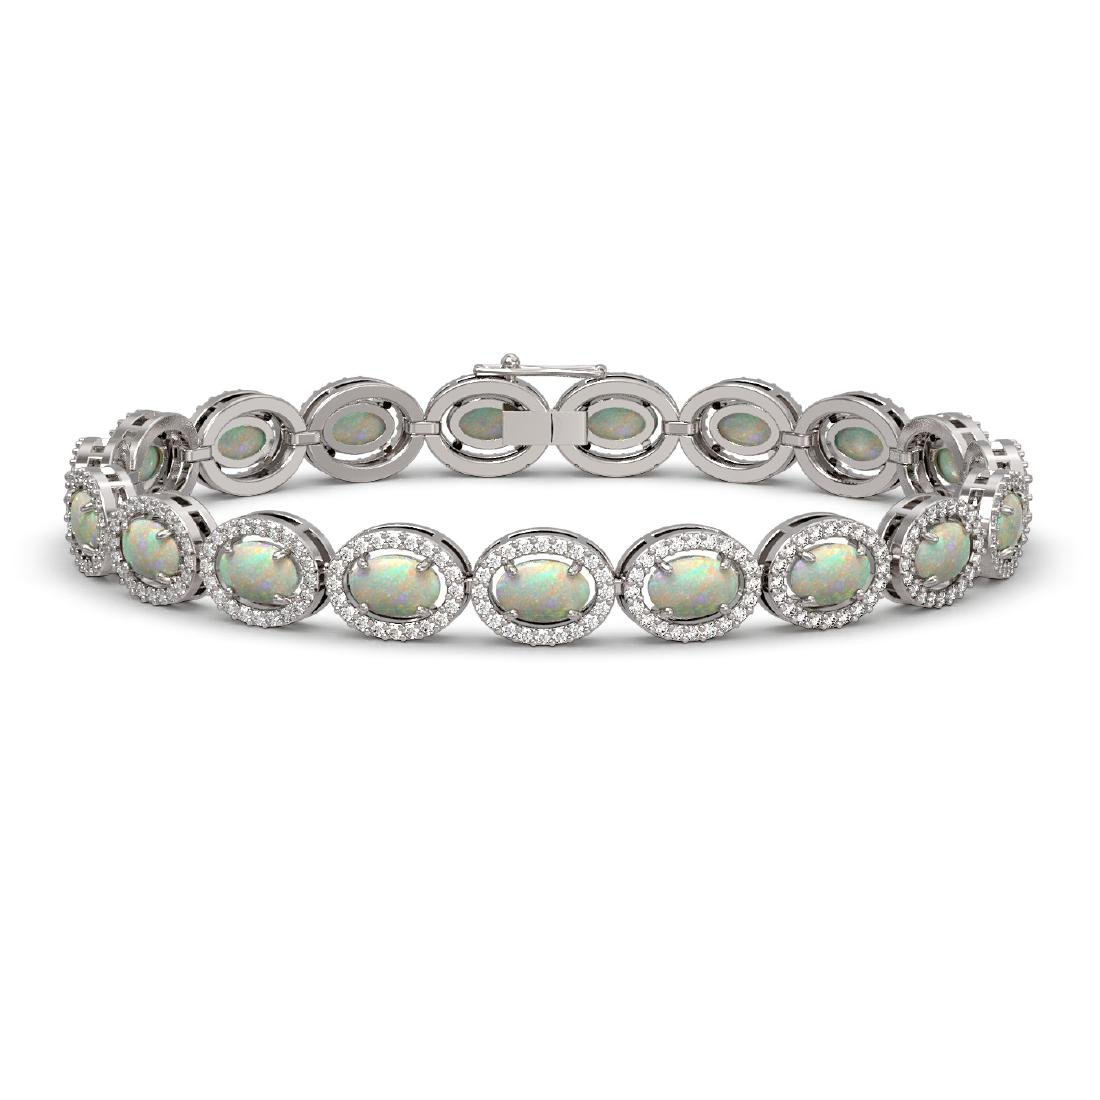 9.5 CTW Opal & Diamond Halo Bracelet 10K White Gold